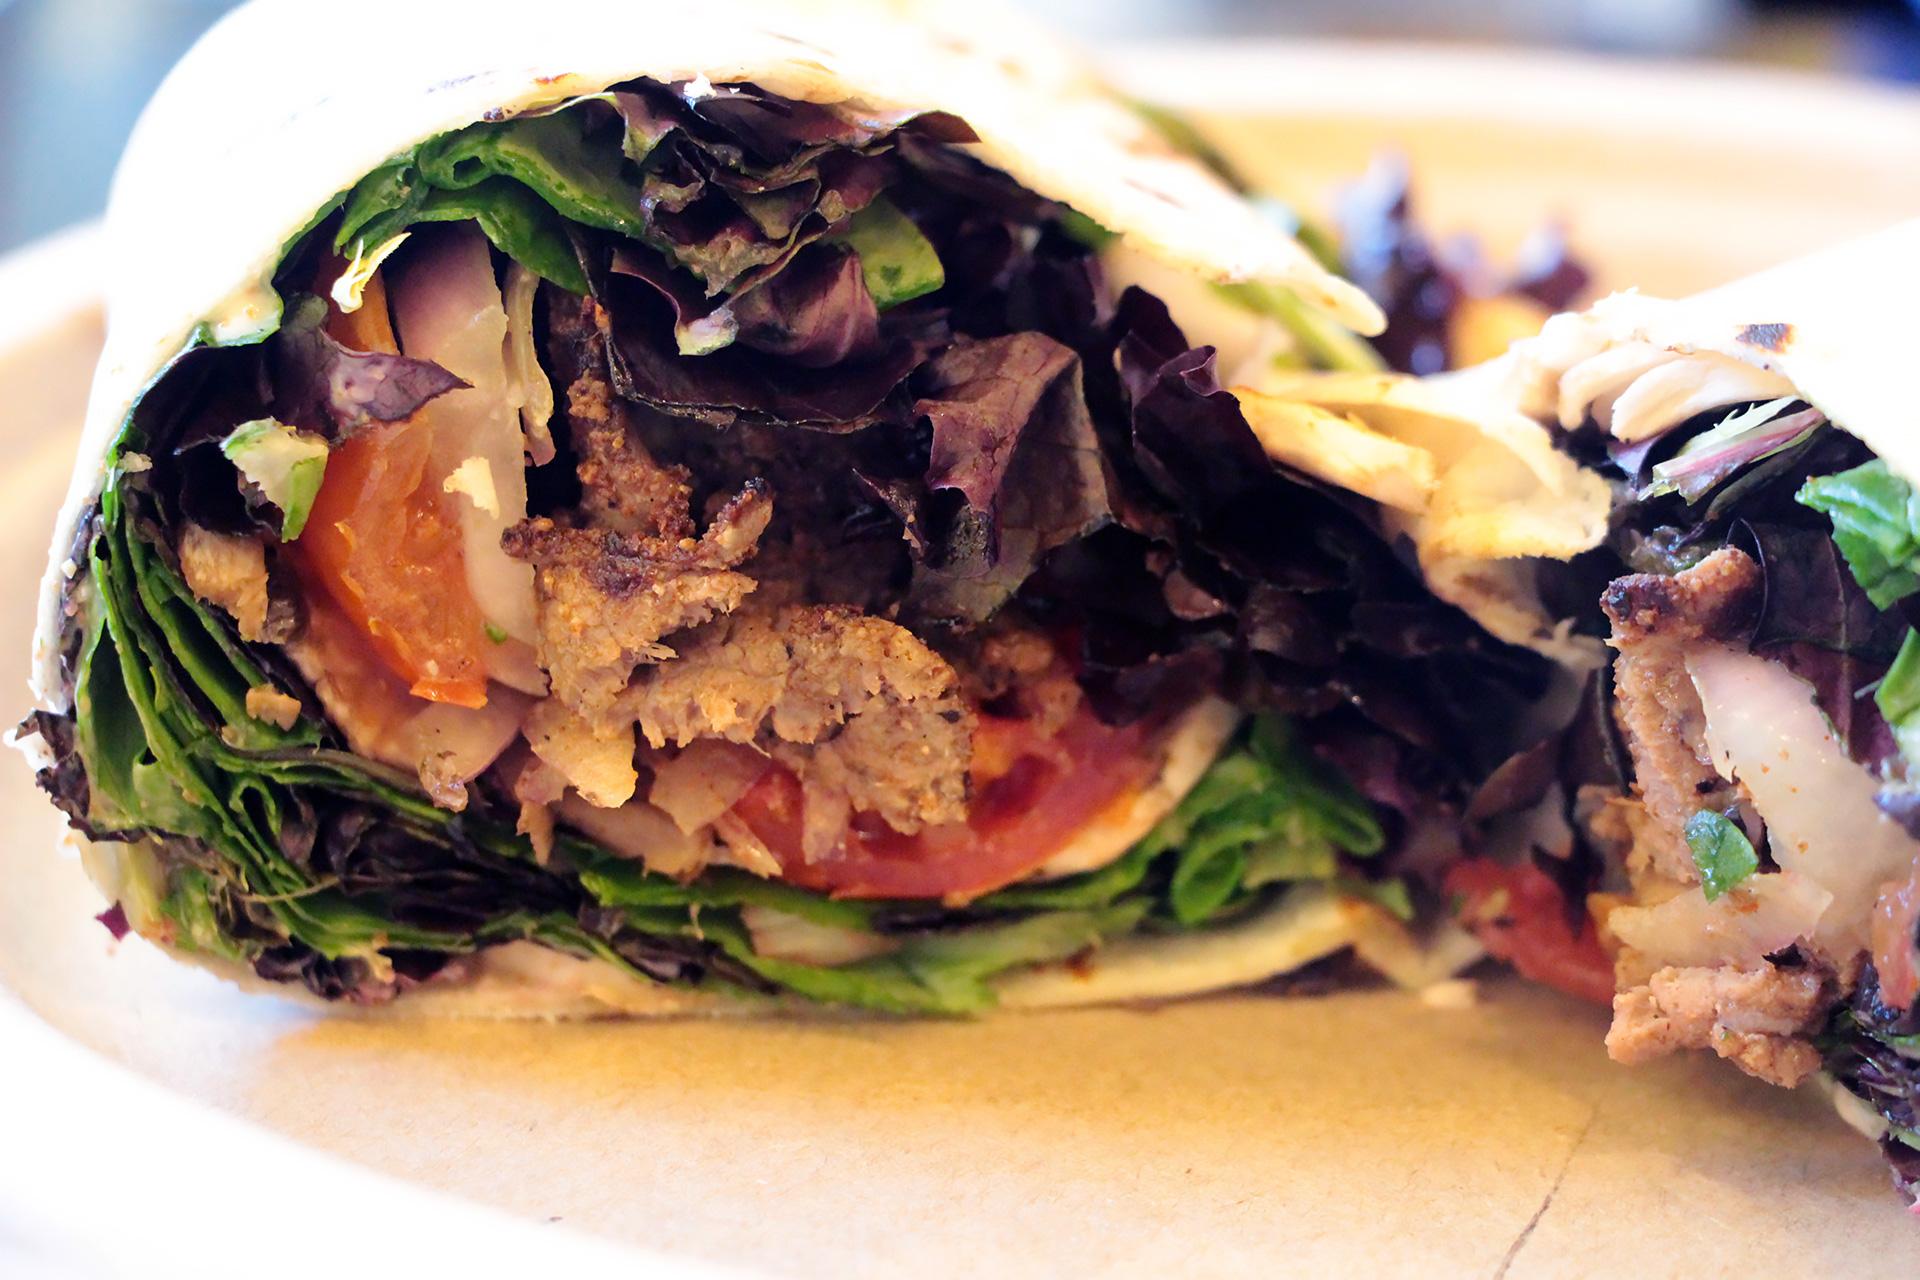 Inside the suya-spiced beef wrap.